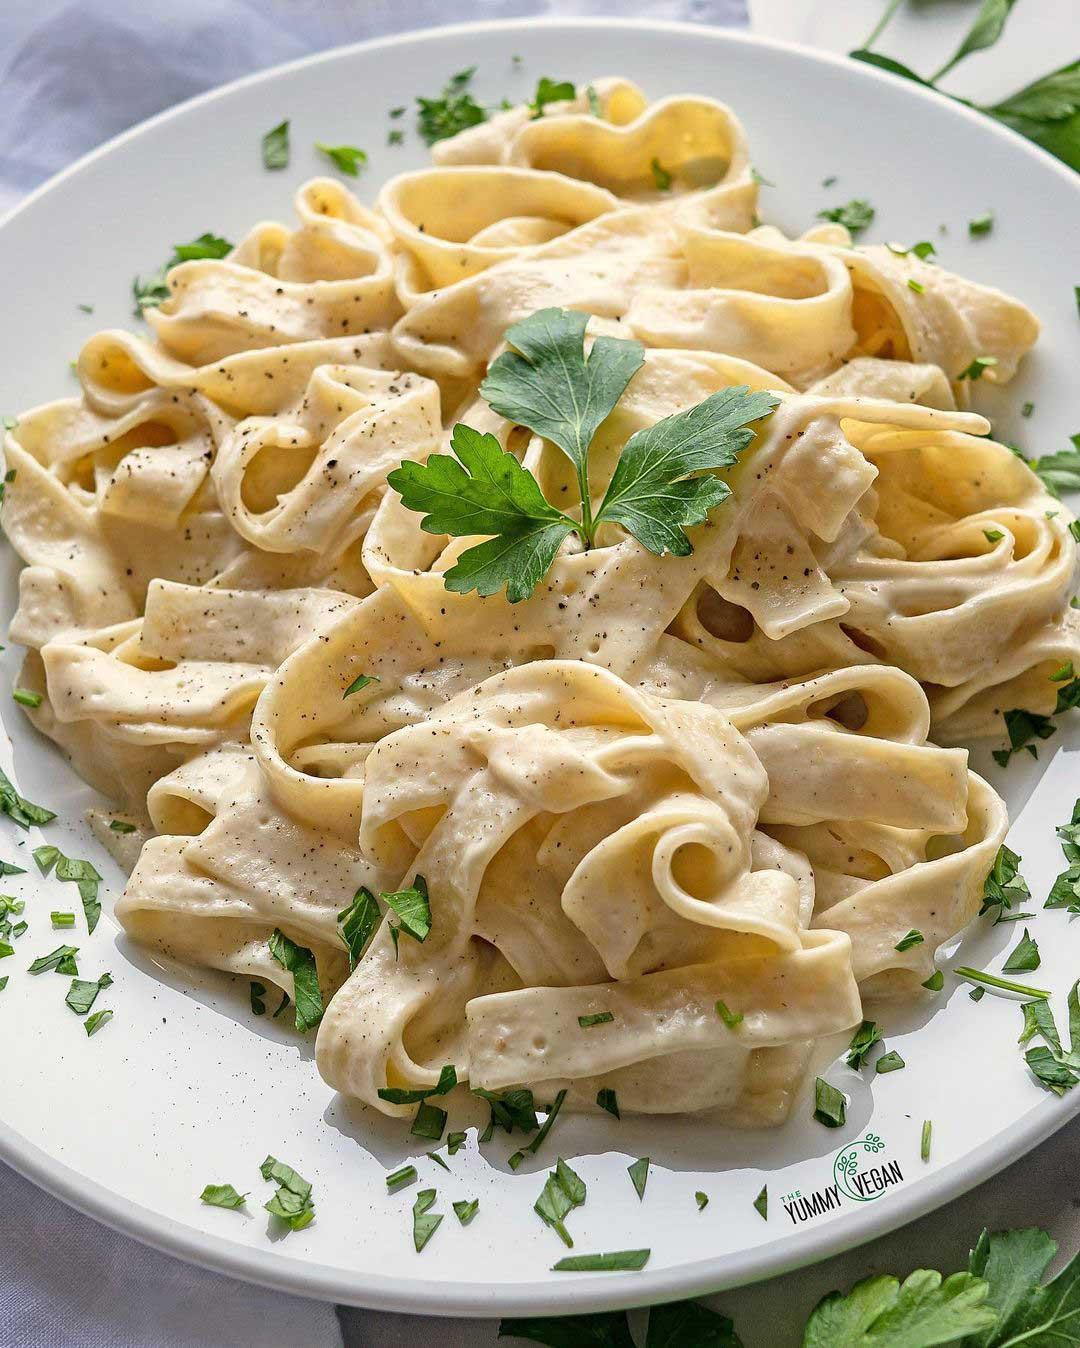 Vegan Fettucine Alfredo recipe served on a plate.